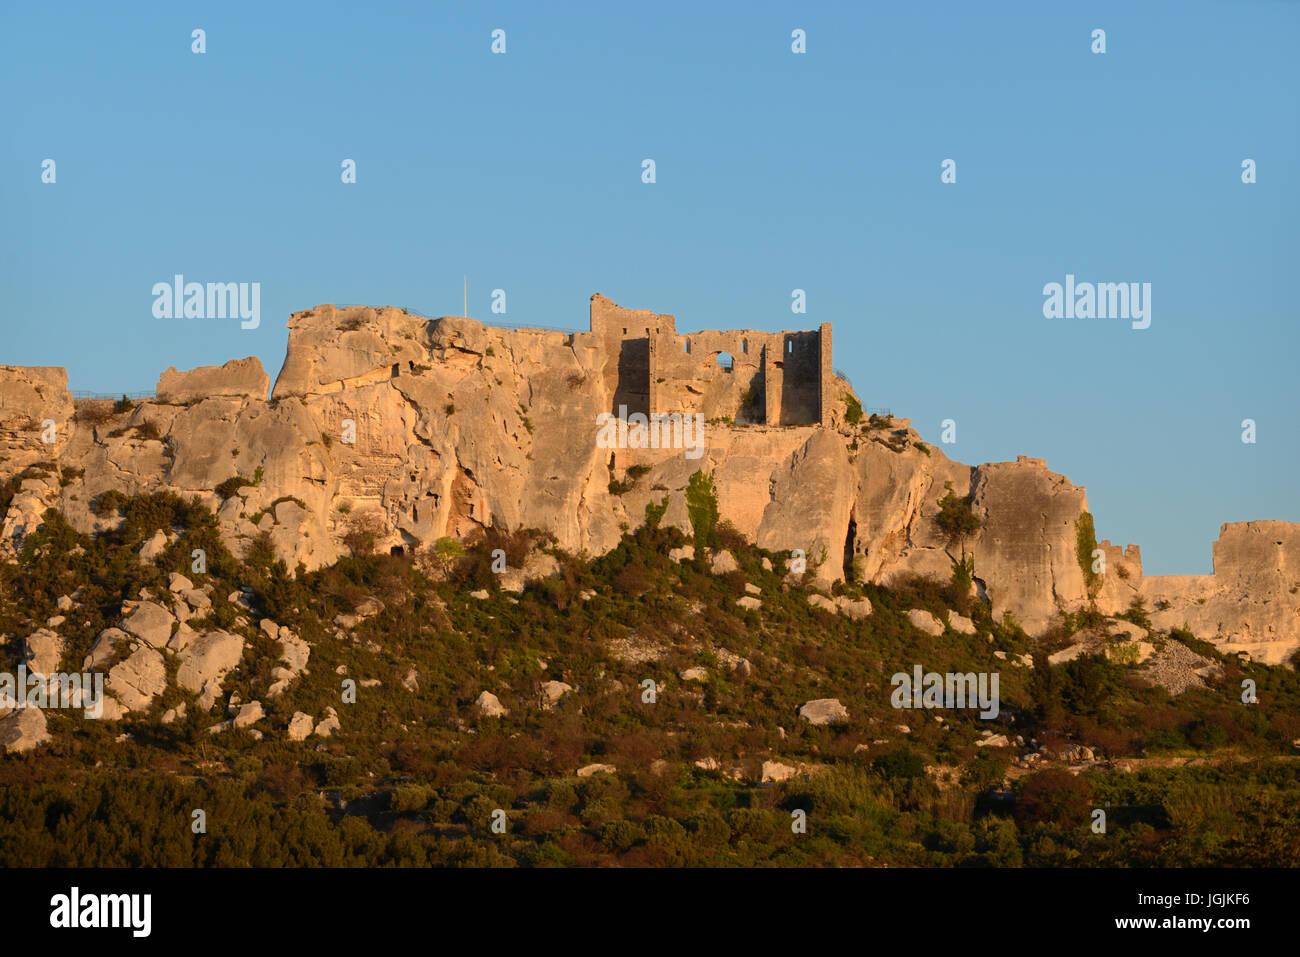 Sunrise over the Eastern Facade of the Ruined Castle Les Baux or Les Baux-de-Provence Hilltop Village Castle in - Stock Image